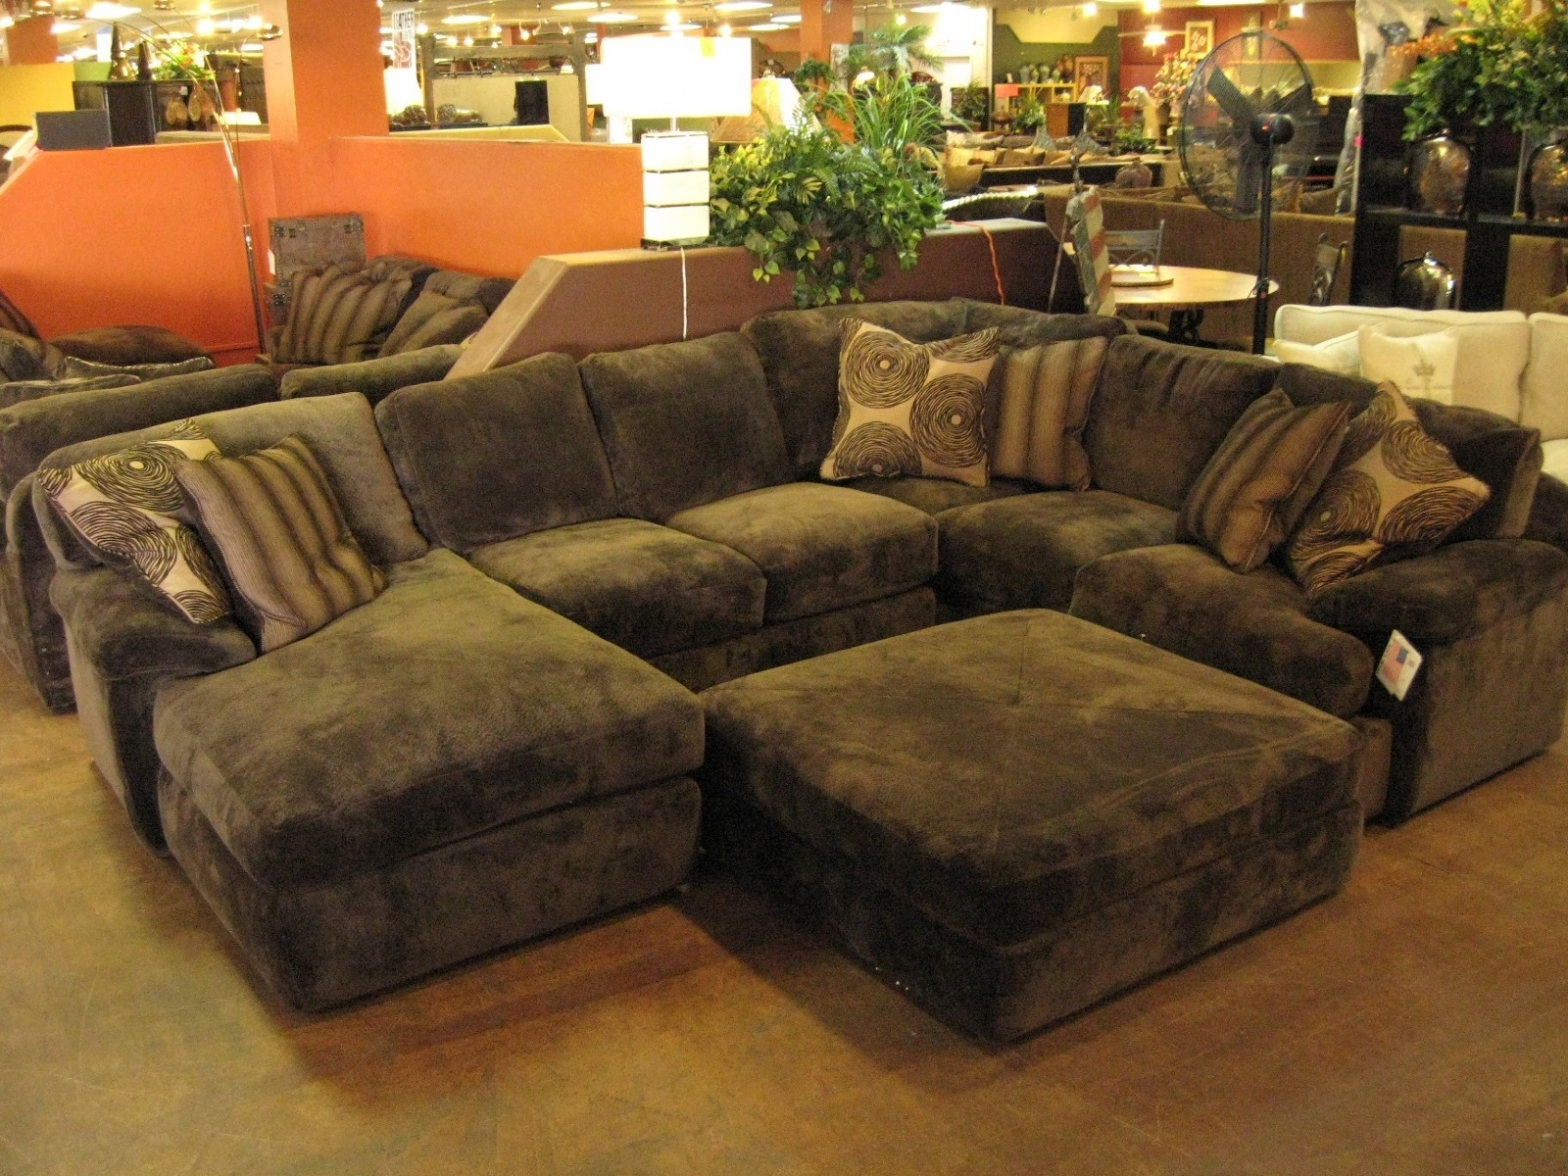 Furniture: Awesome Amazon Sectional Sofas 77 On The Brick Sectional Intended For Sectional Sofas At Amazon (Image 5 of 10)